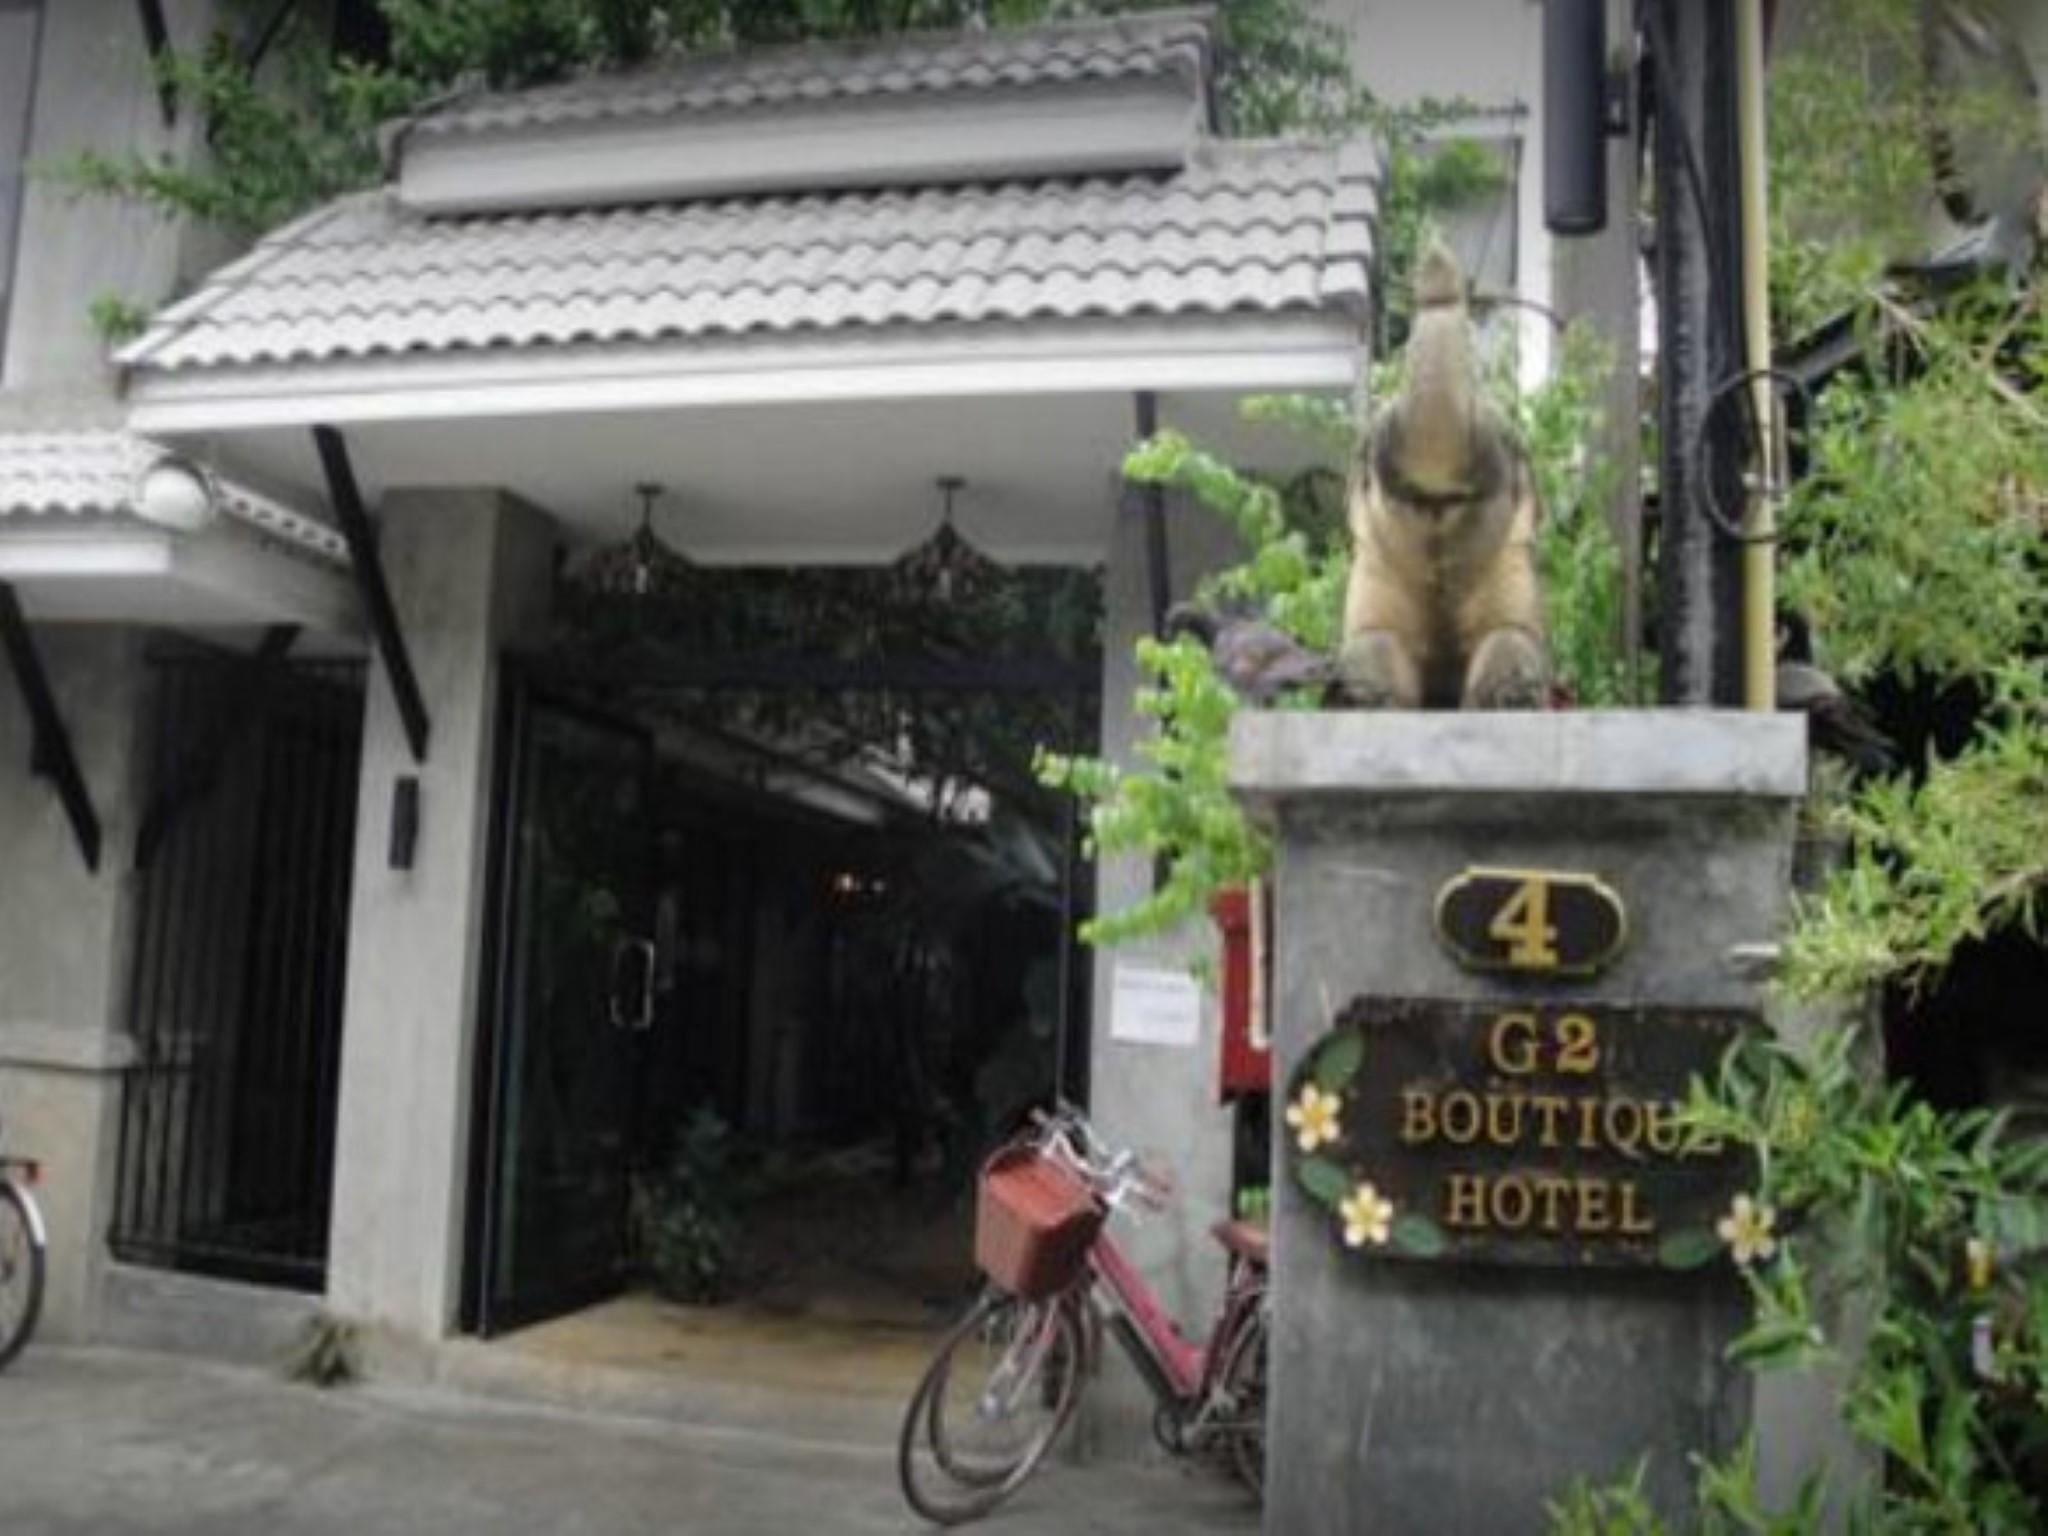 G2 Boutique Hotel จี2 บูทิค โฮเต็ล